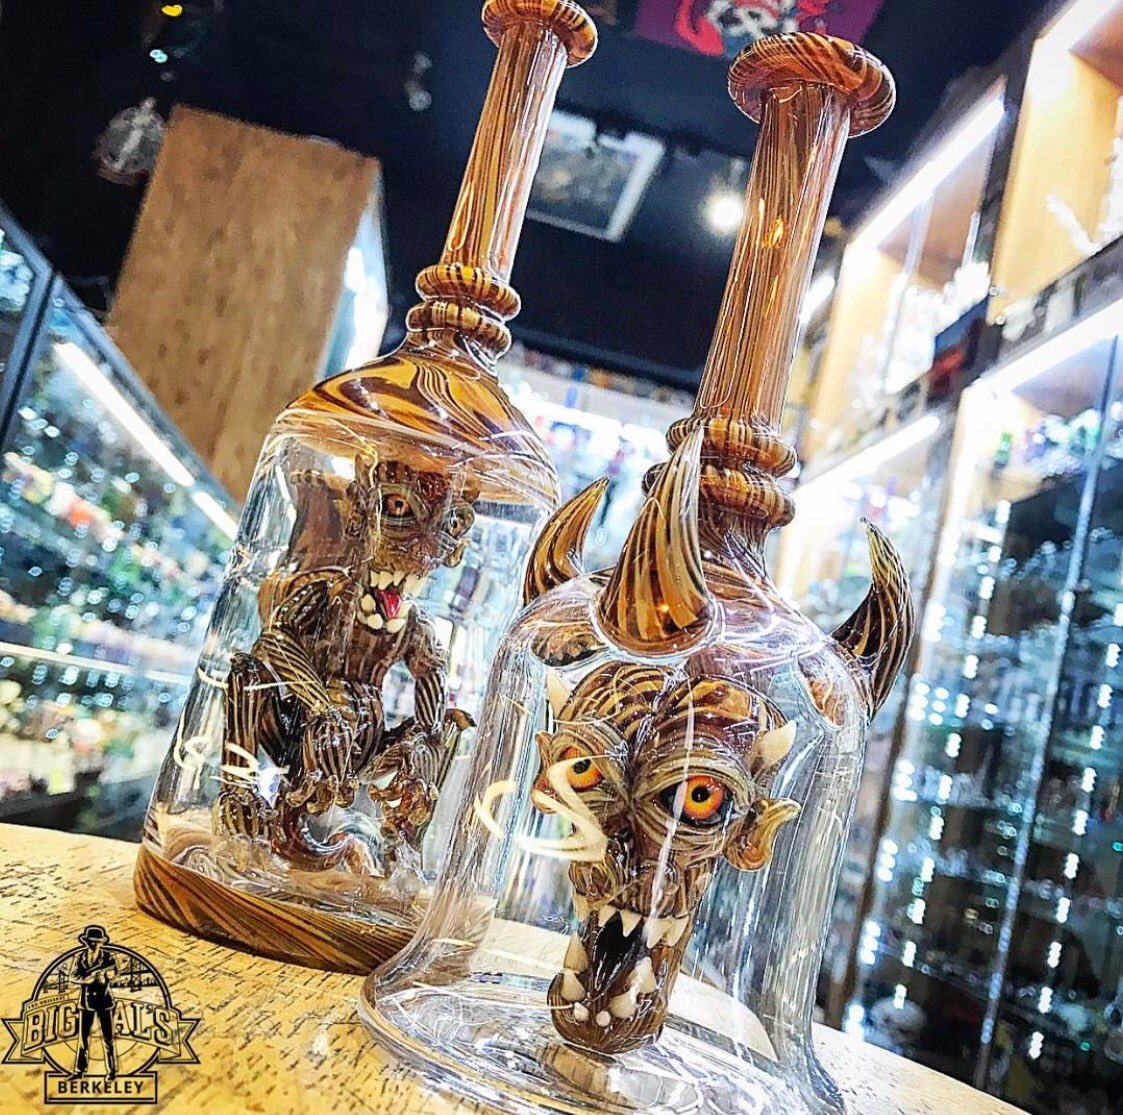 Woody ina bottle by @kalebfolckglass #woody #wood #fresh #genieinabottle #devil #demon #sick #headyglass #headshop #berkeley #bayarea<br>http://pic.twitter.com/olLTmGiTnc